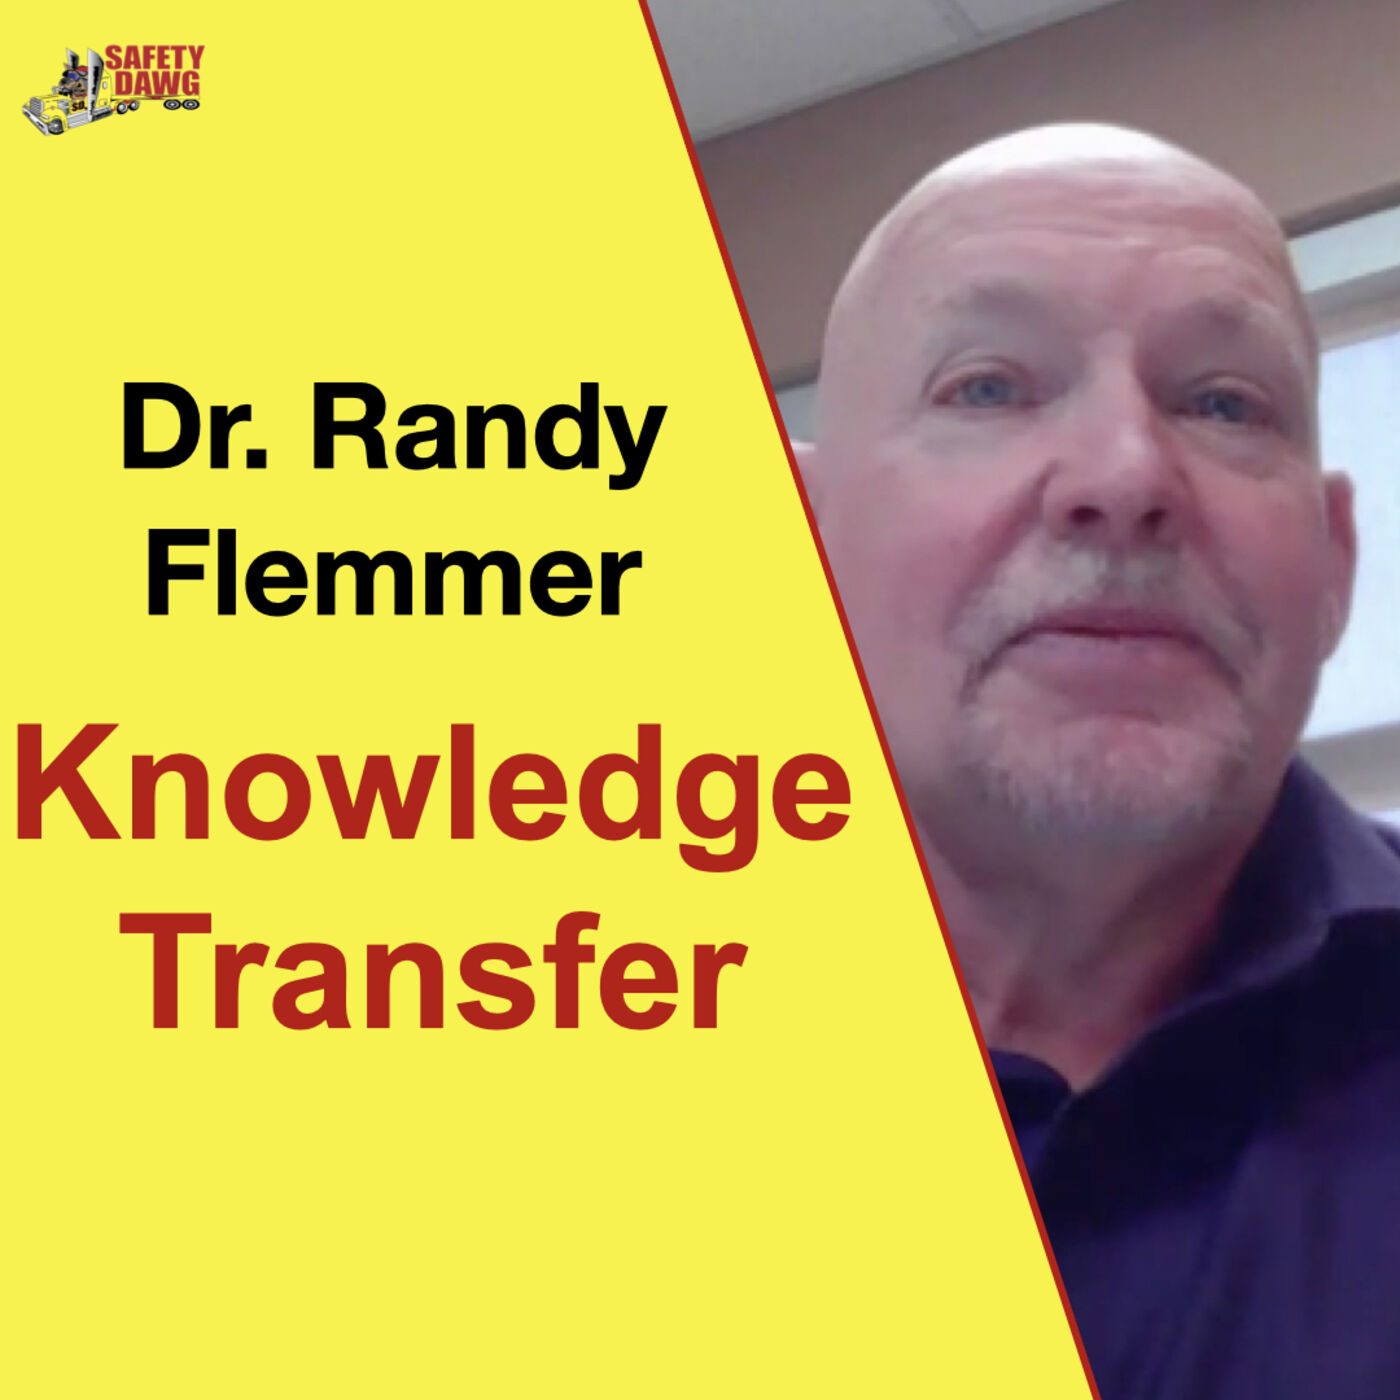 Training, How To Transfer Knowledge? Dr. Randy Flemmer, Fleet Safety International